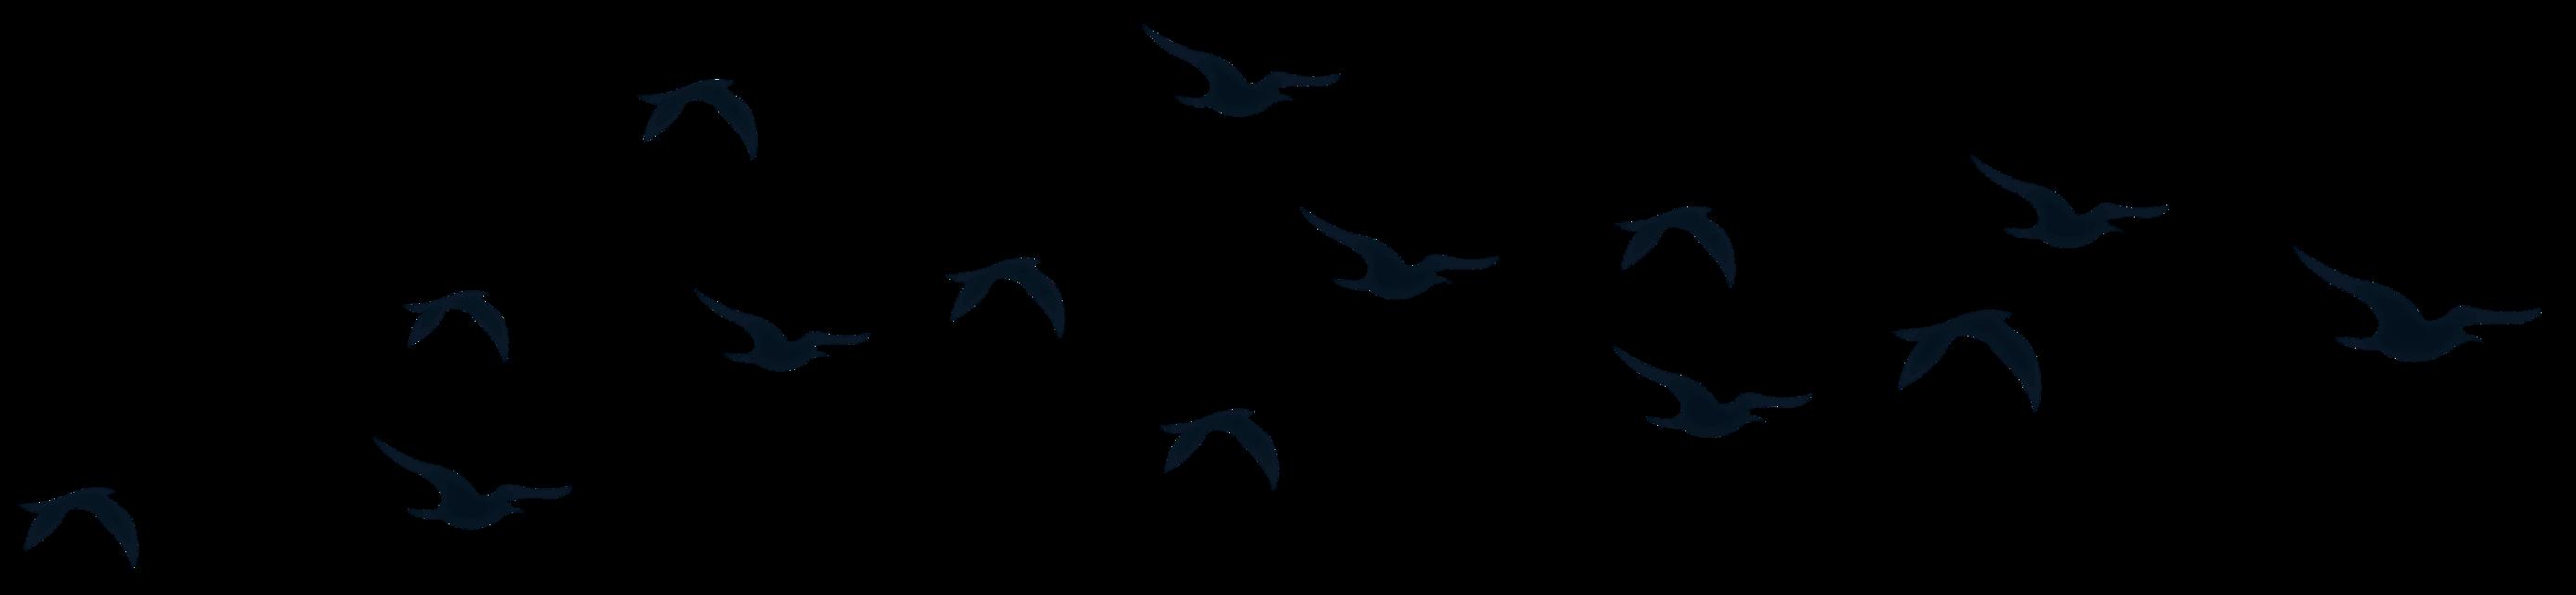 #birds #silhouette #nature #FreeToEdit